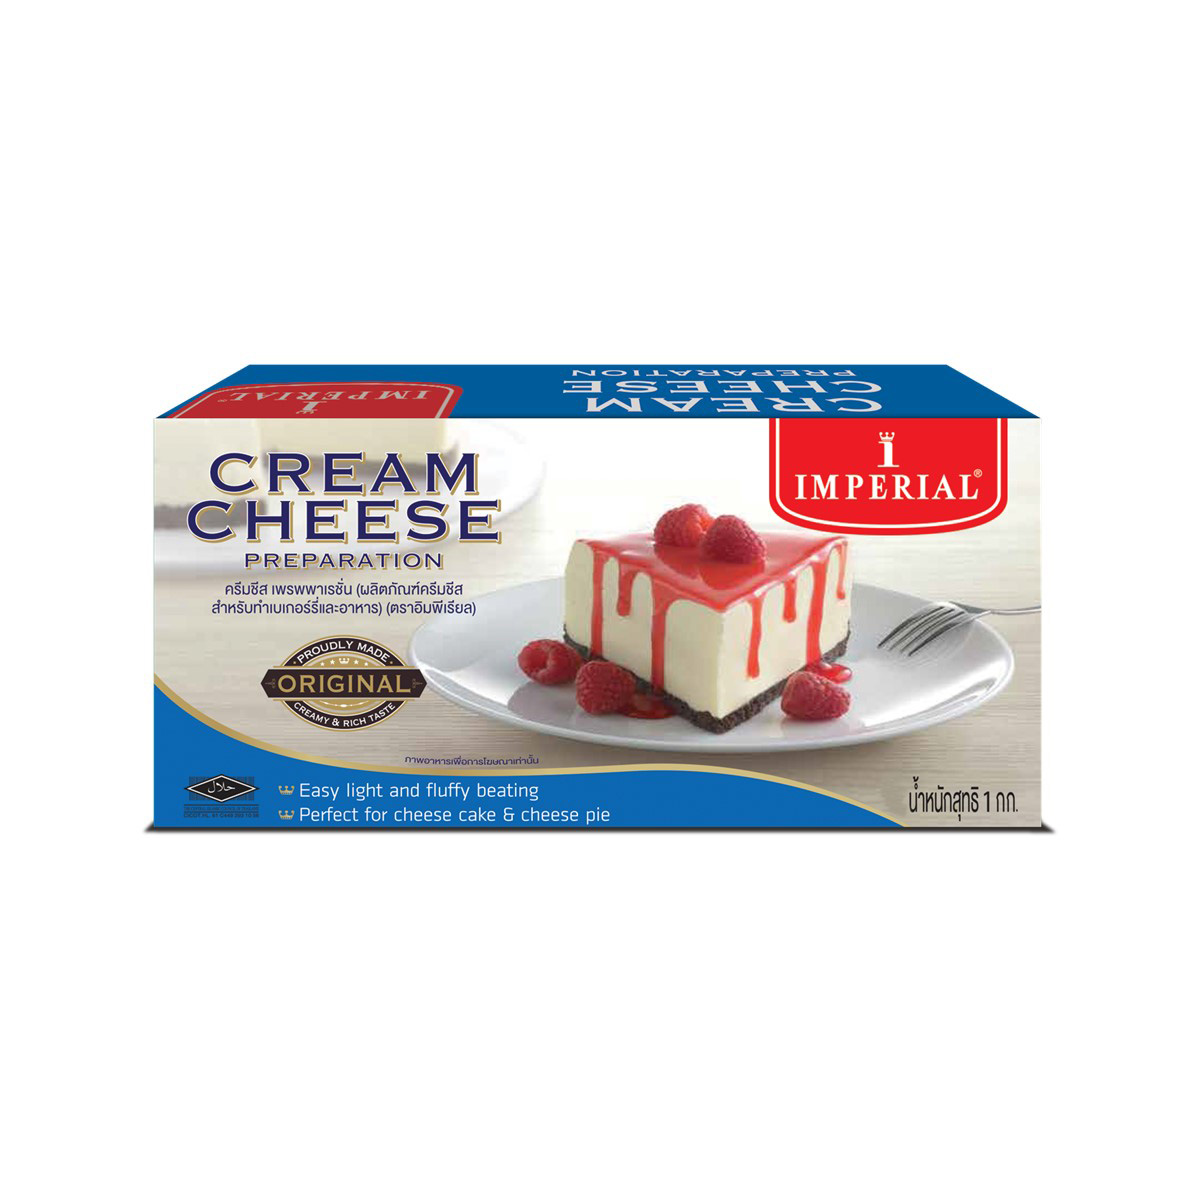 10. Imperial Cream cheese 1 kg. ราคา 275 บาท